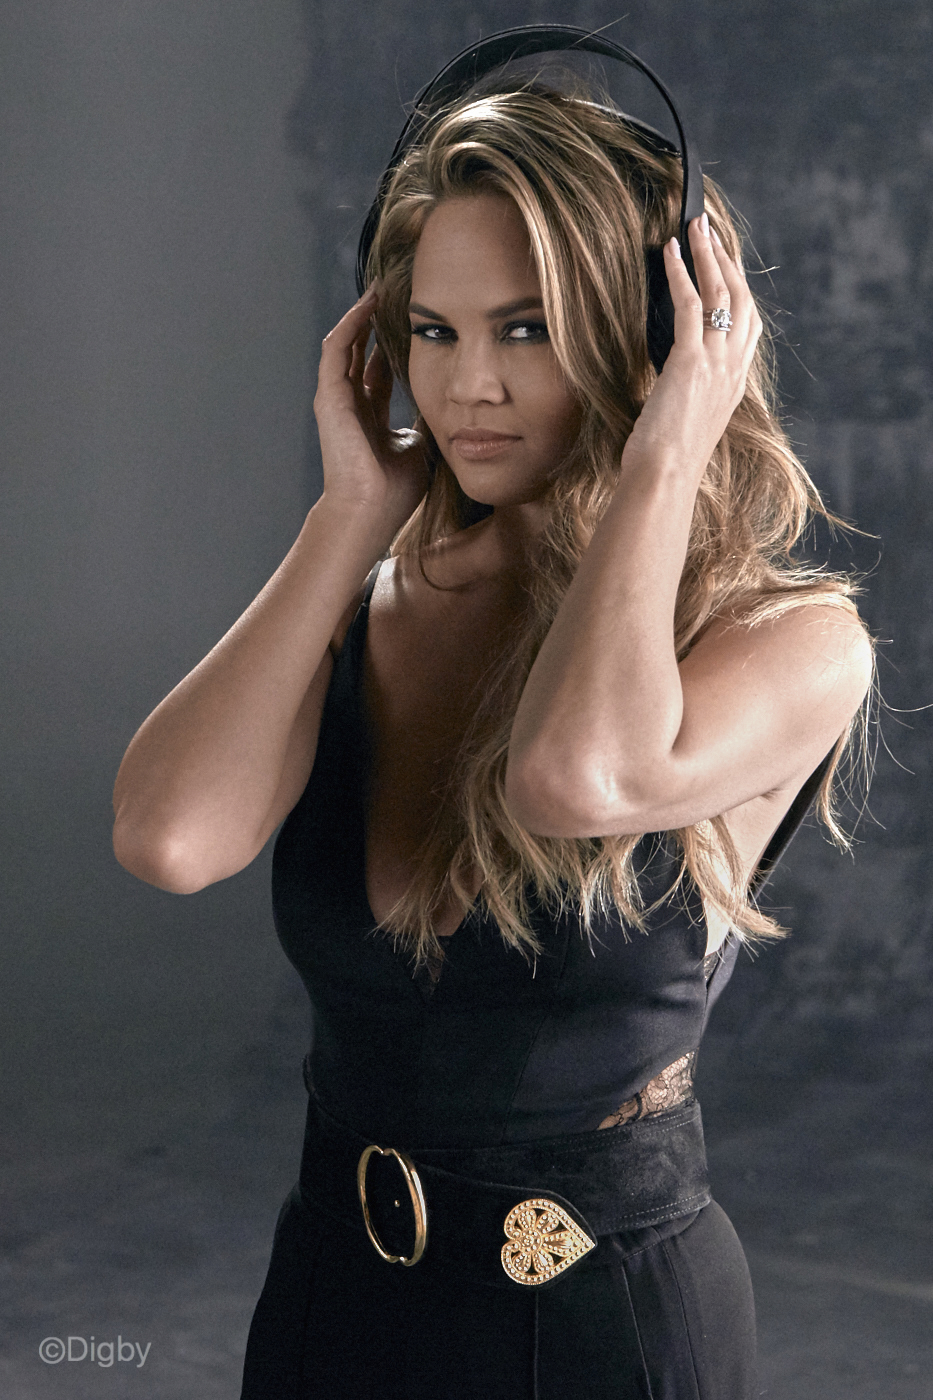 Chrissy Teigen, actress